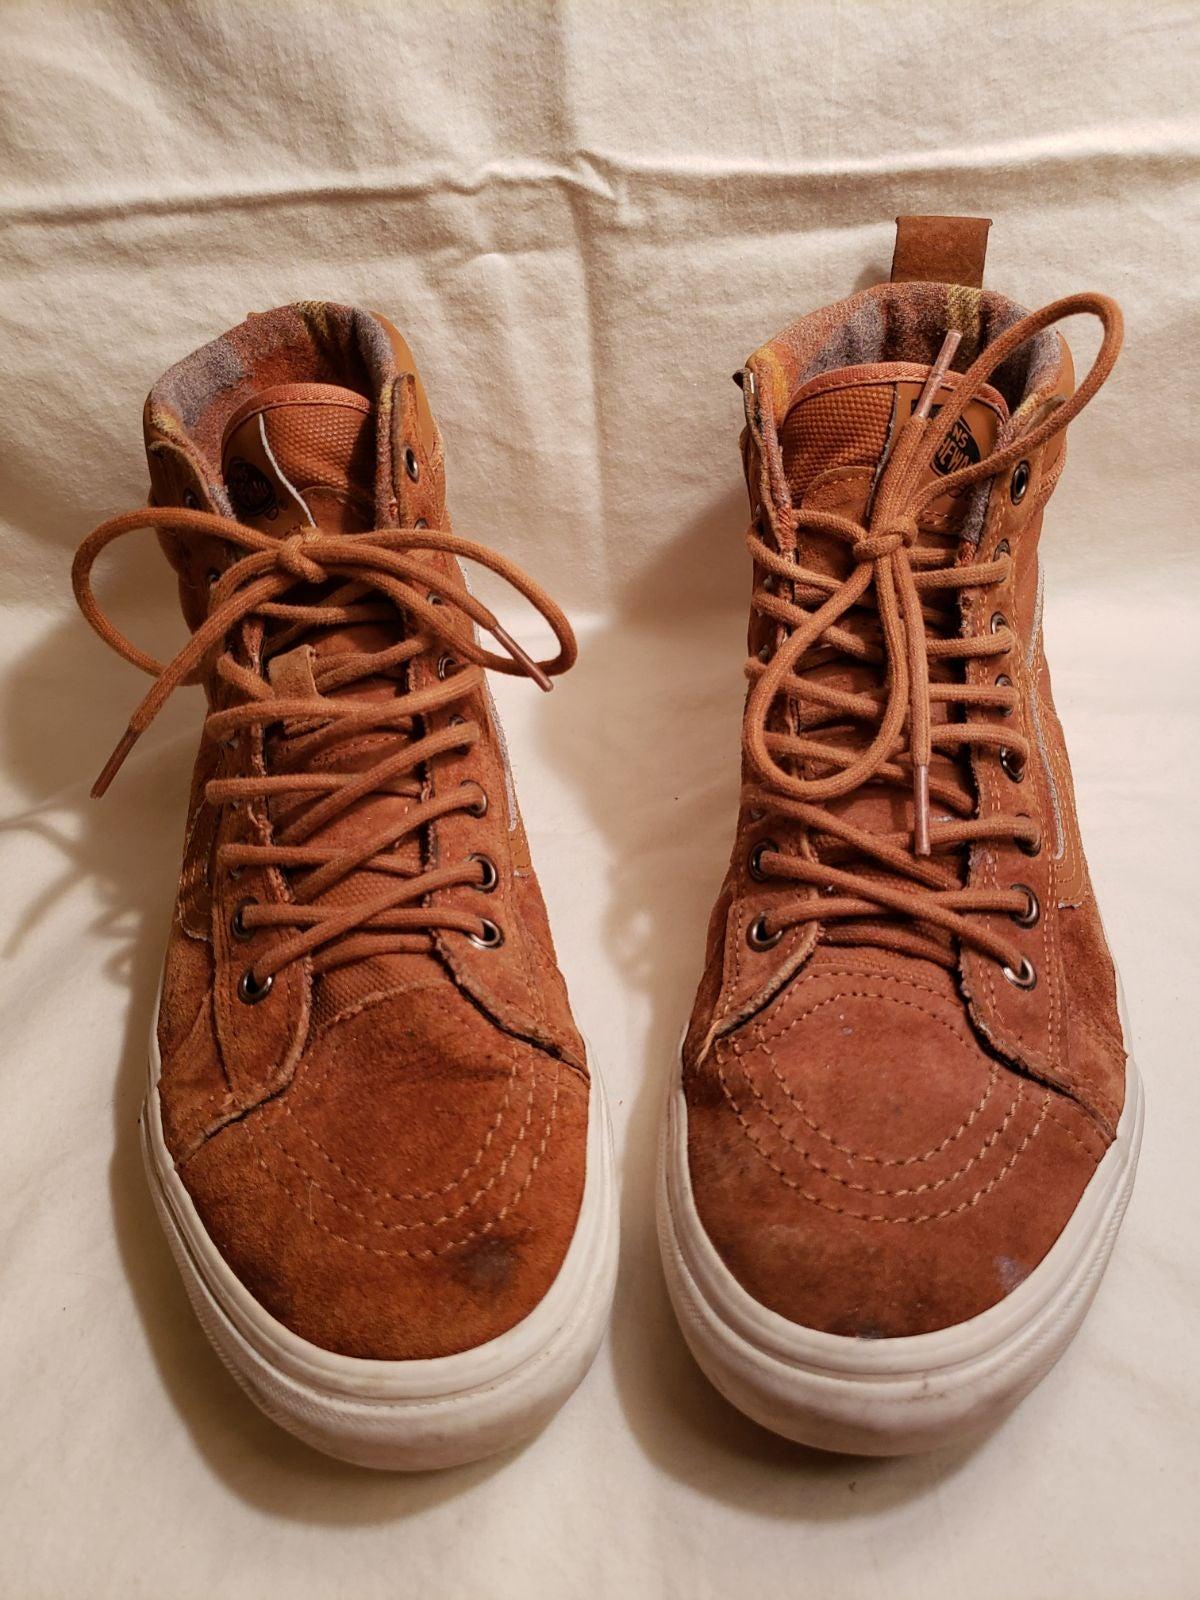 VANS Sk8-hi brown lace ups with flannel